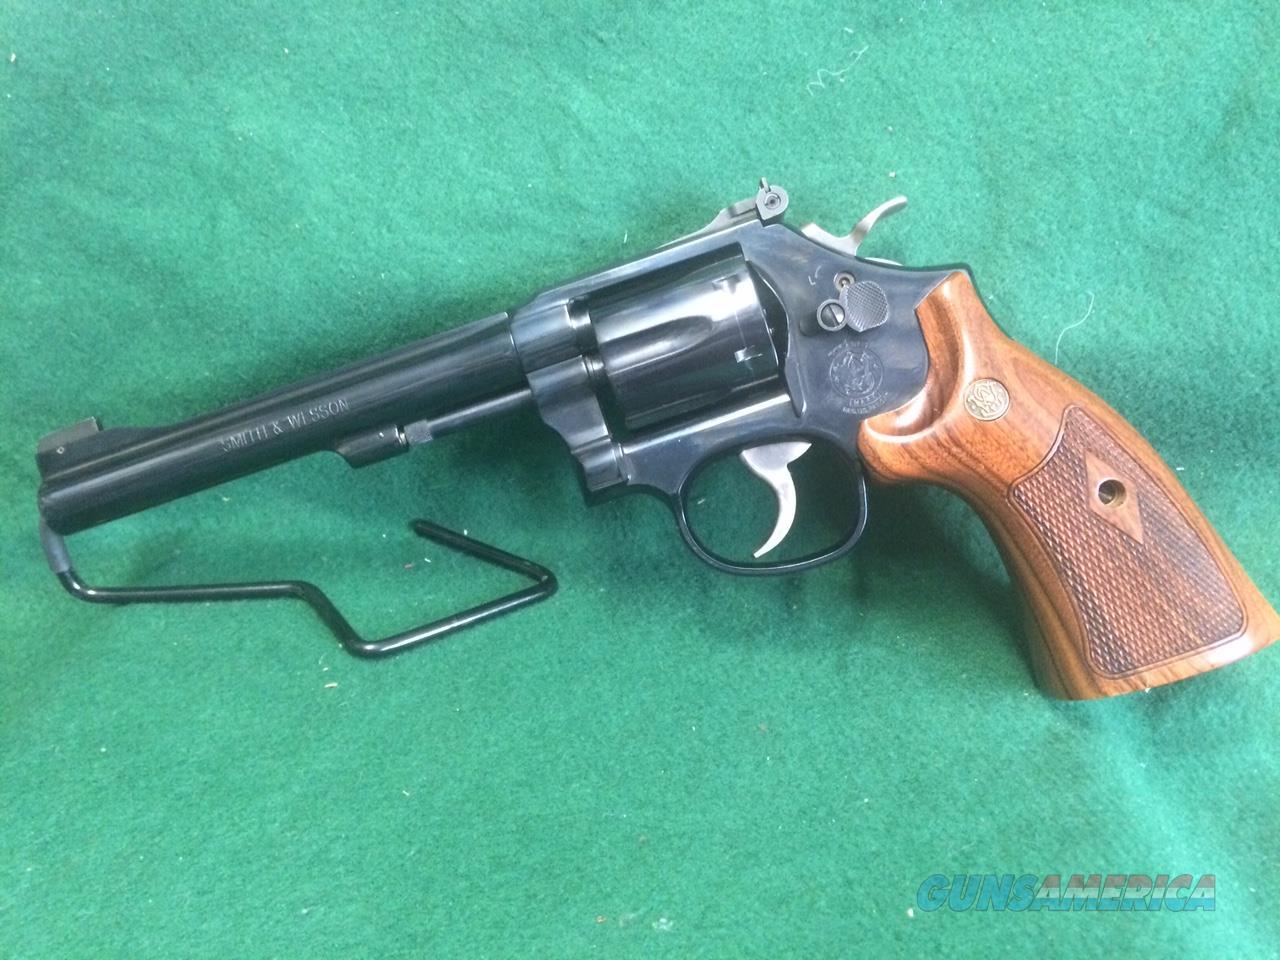 Smith & Wesson Model 48  Guns > Pistols > Smith & Wesson Revolvers > Full Frame Revolver